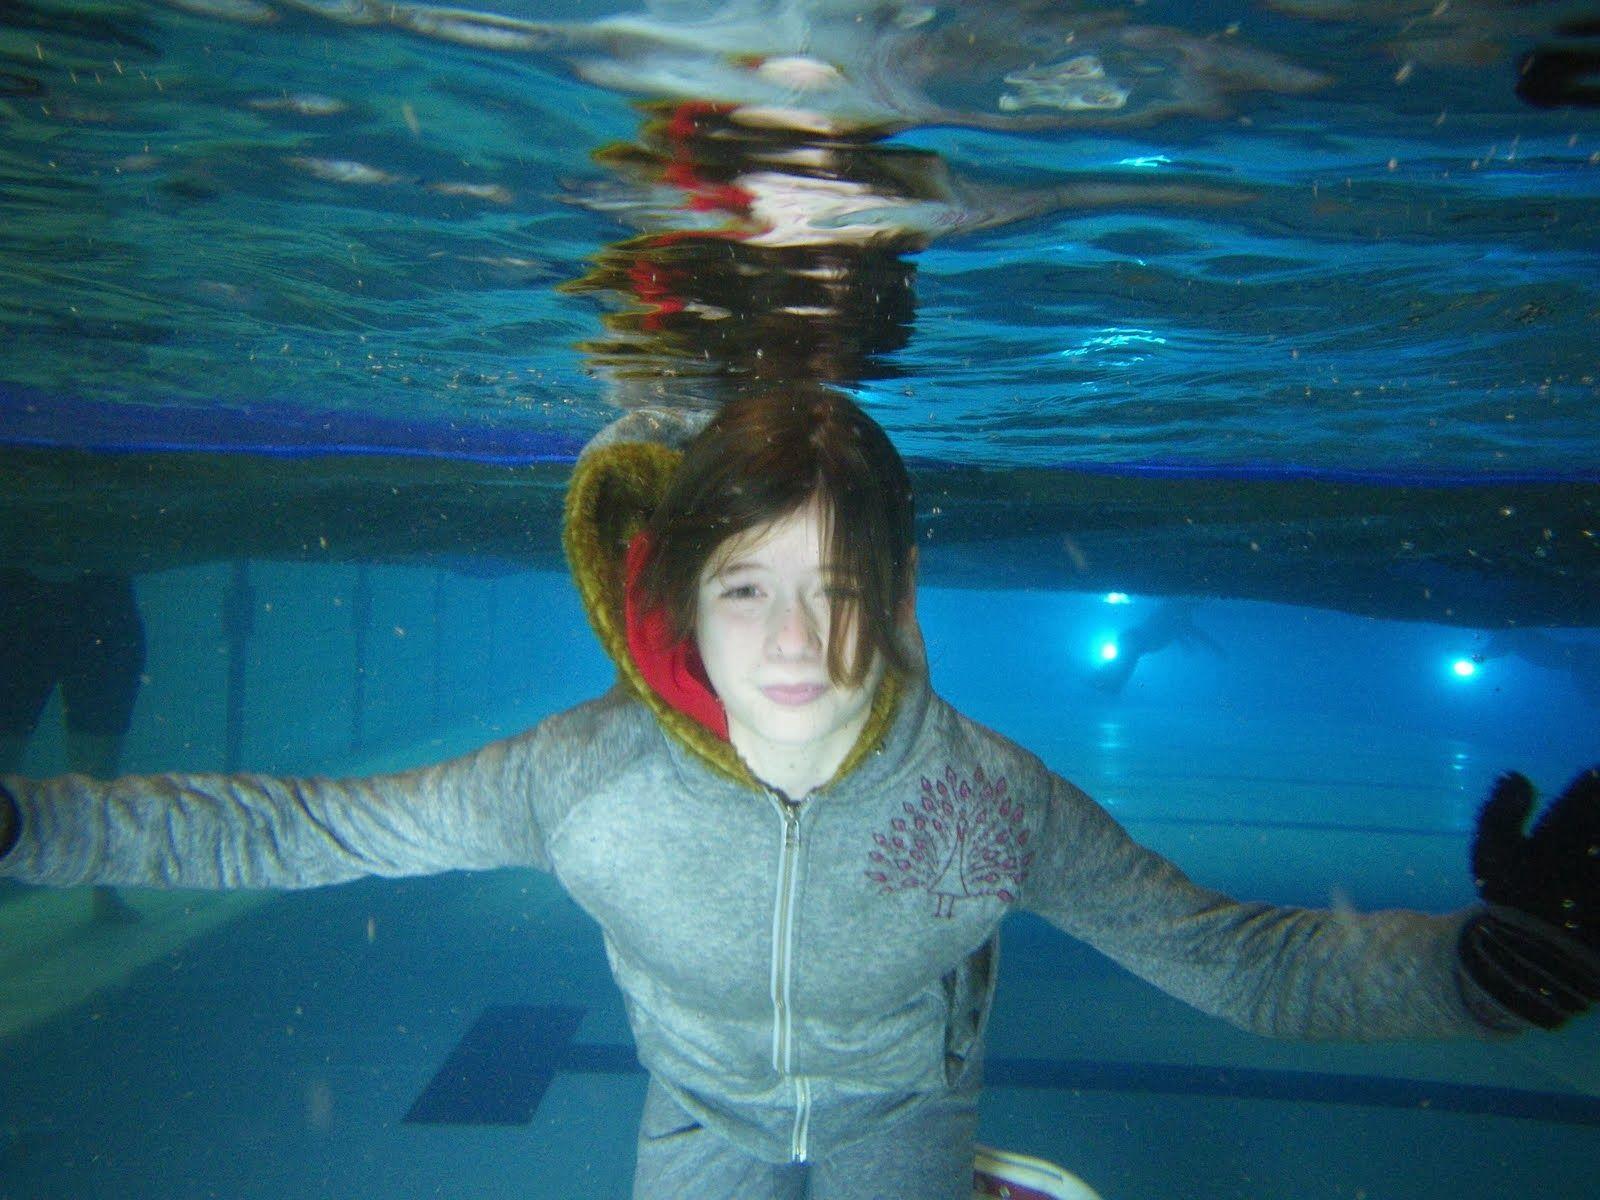 Girl underwater with winter clothes girls underwater at school